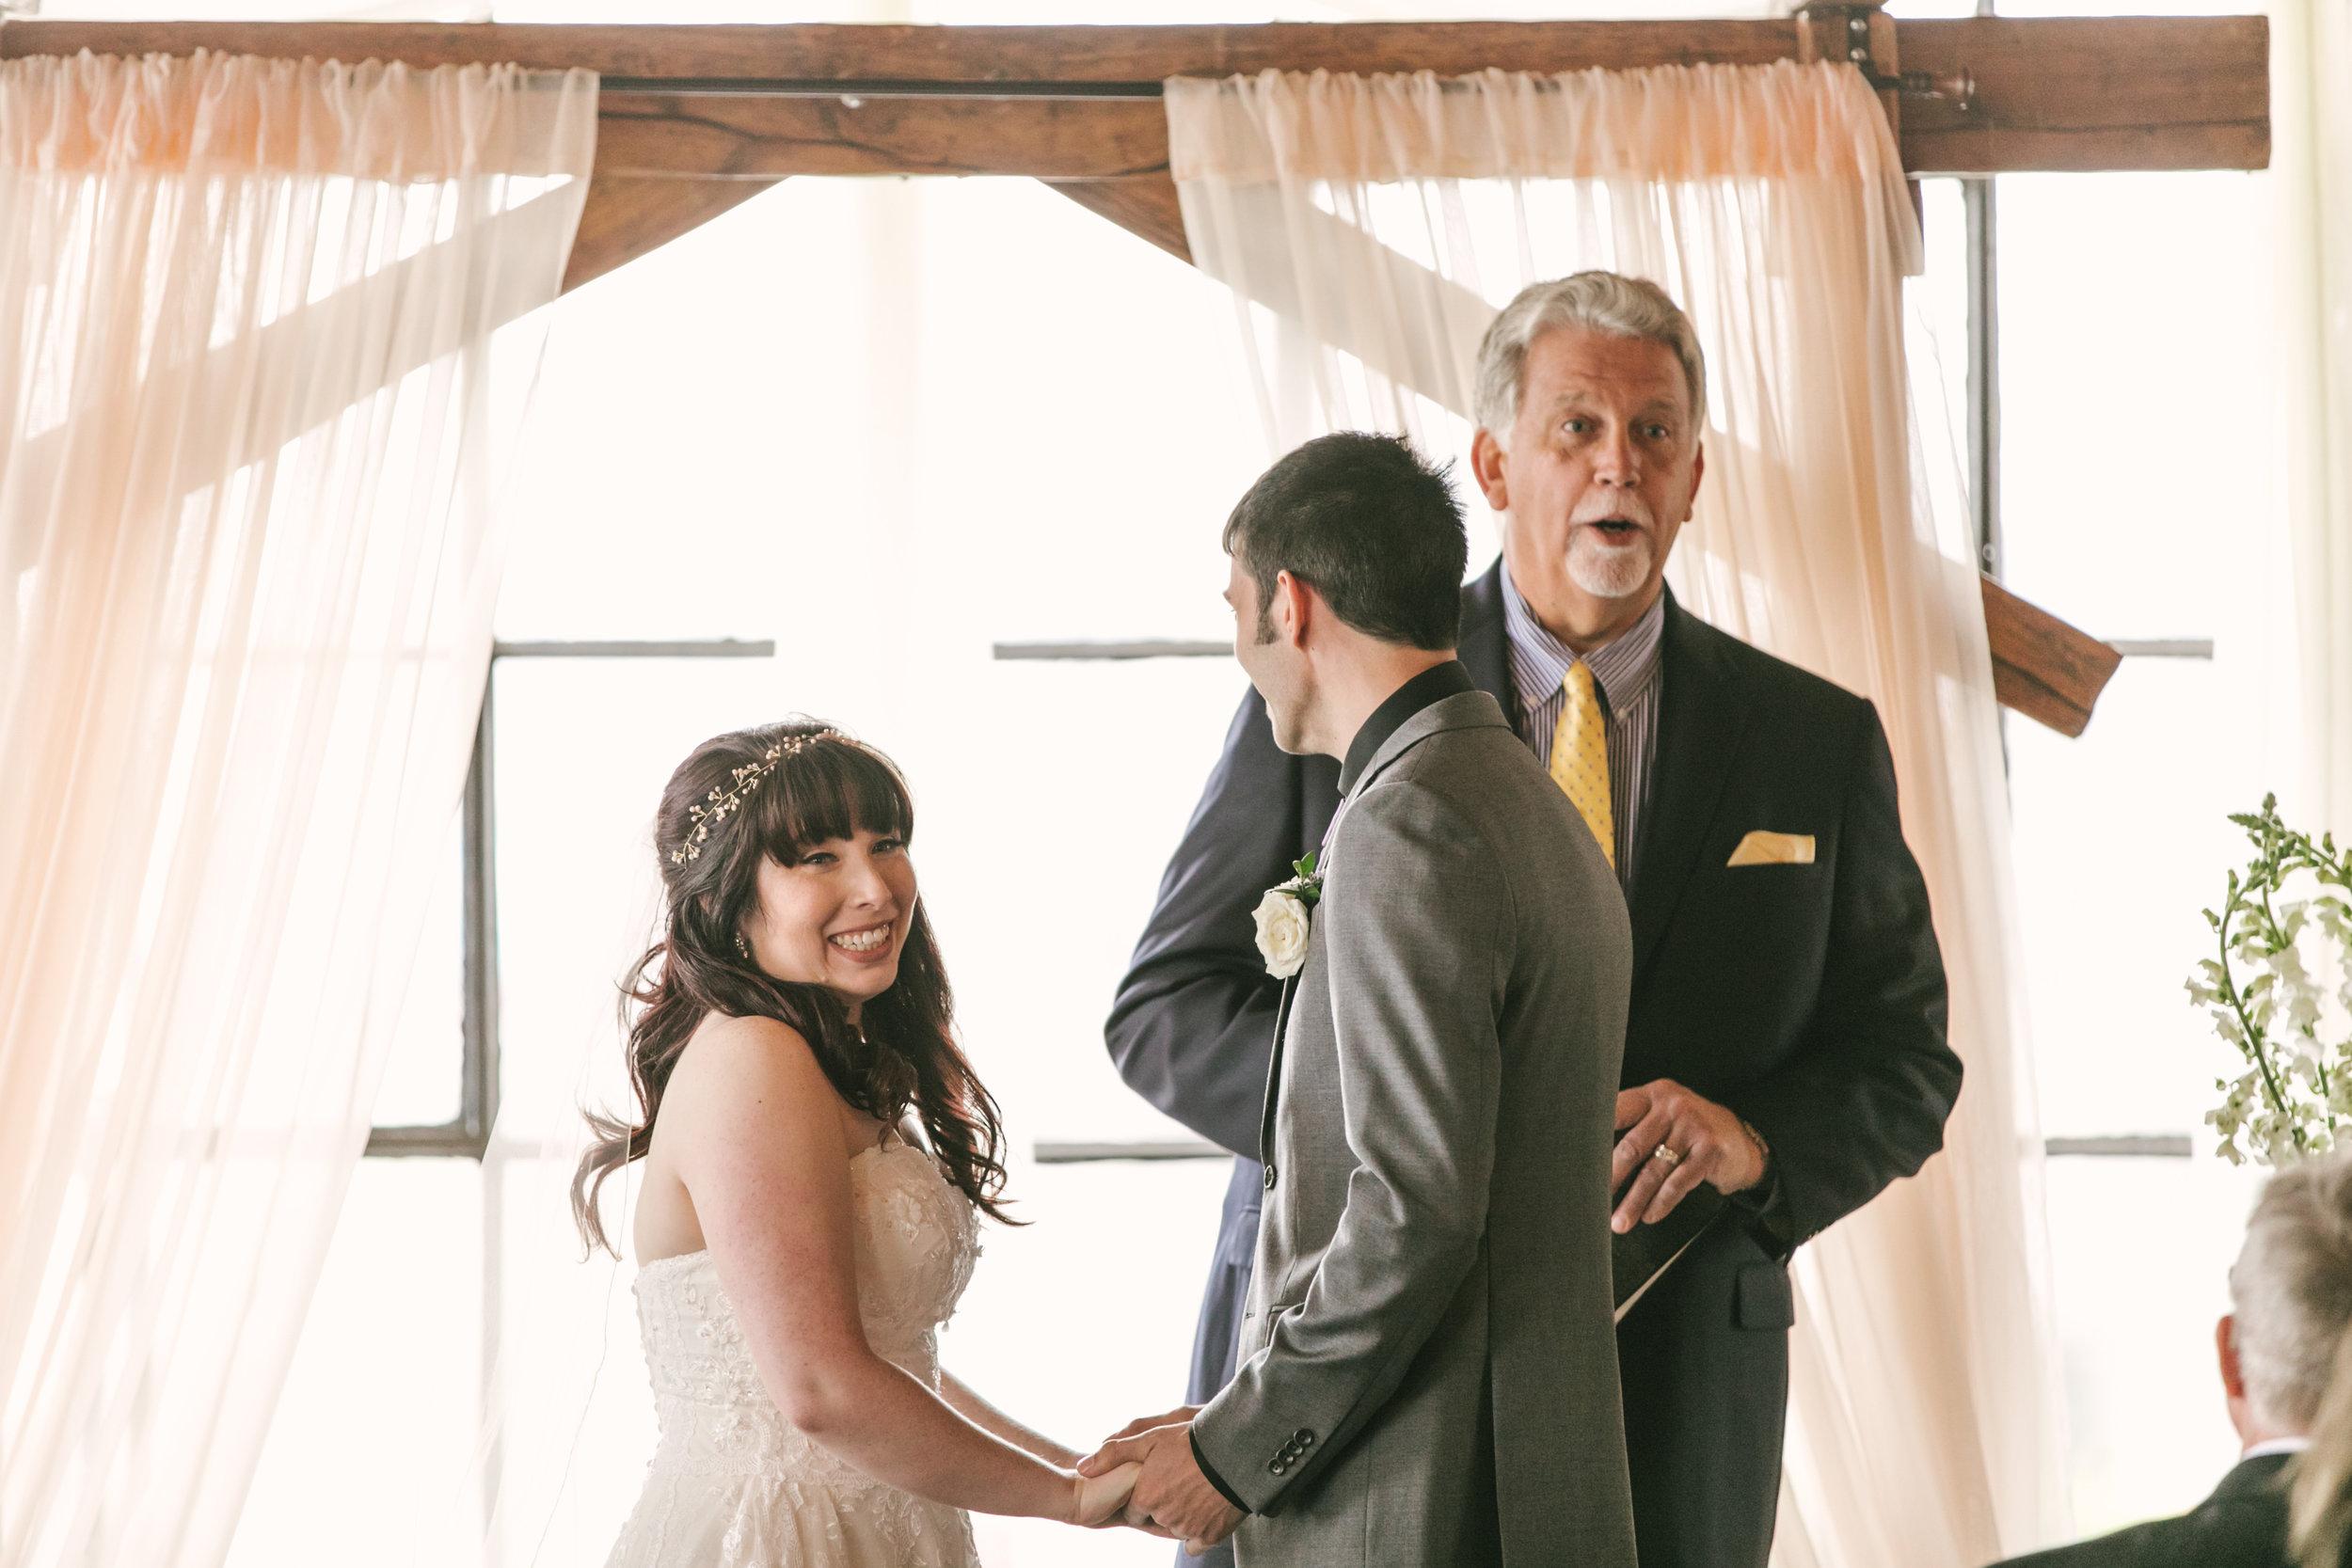 508_Colin+Jessica_Wedding.jpg